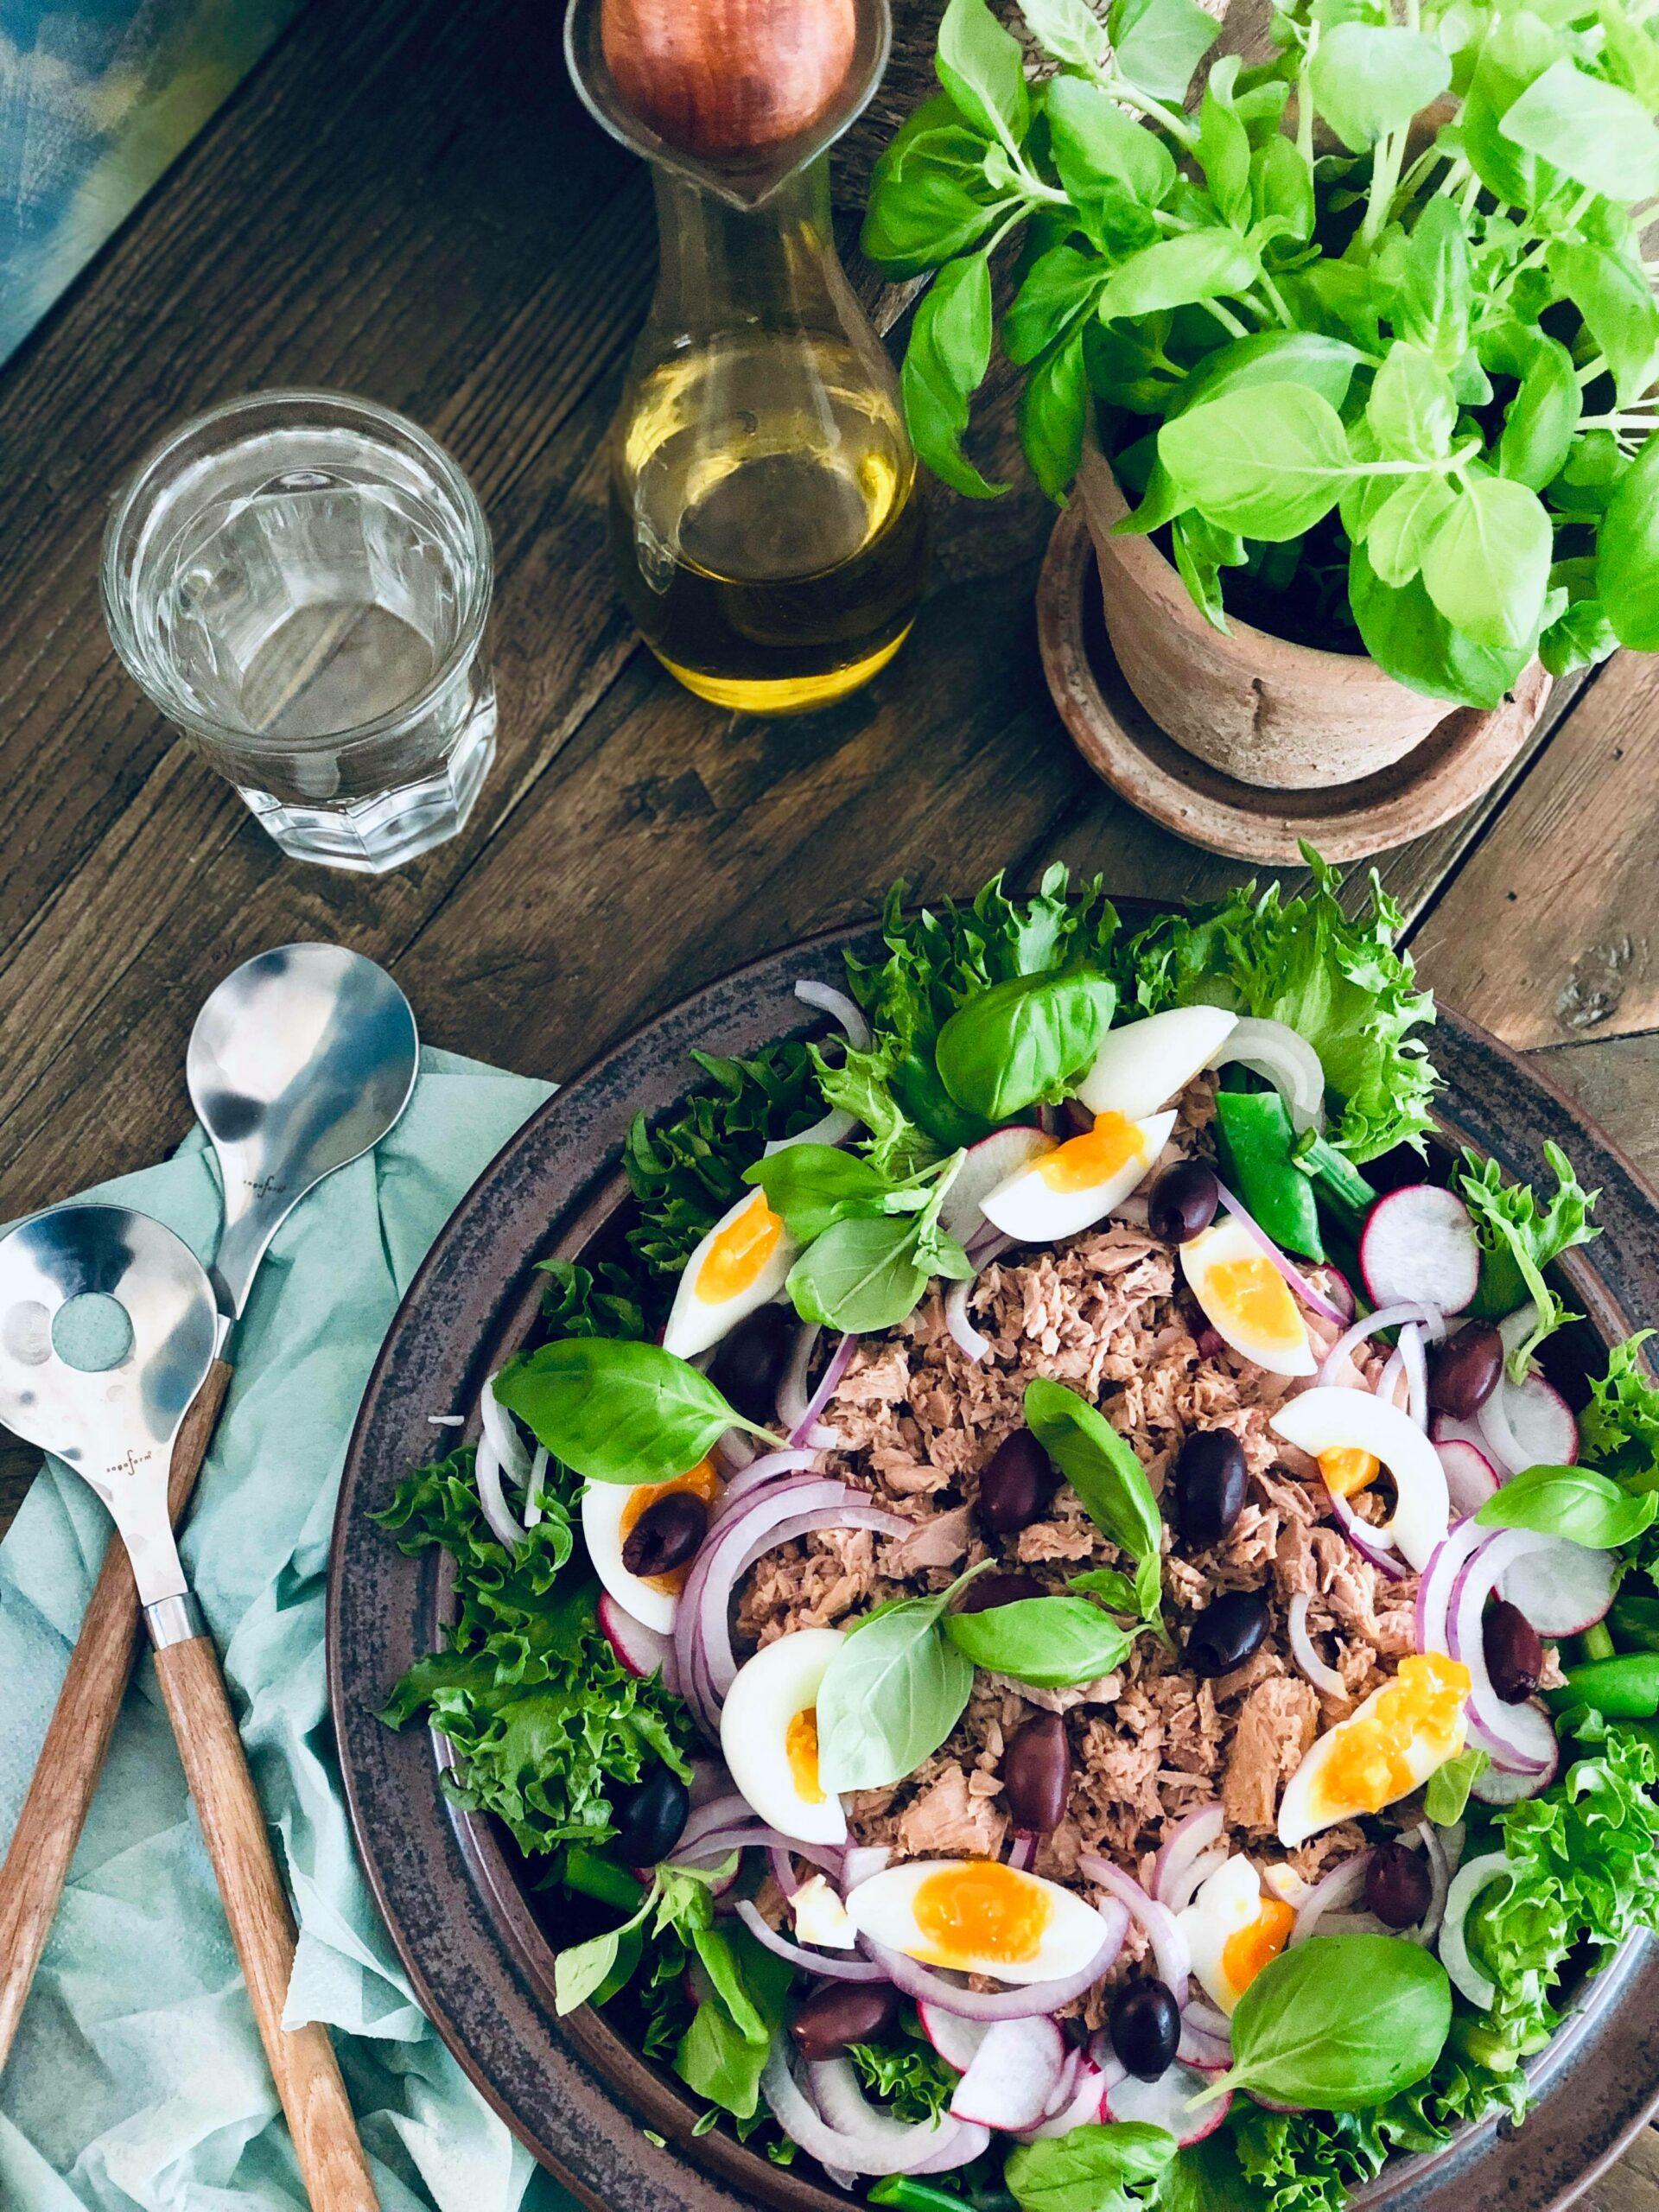 Tunfisksalat med tunfisk, egg, salat, kalamata oliven, basilikum og olivenolje